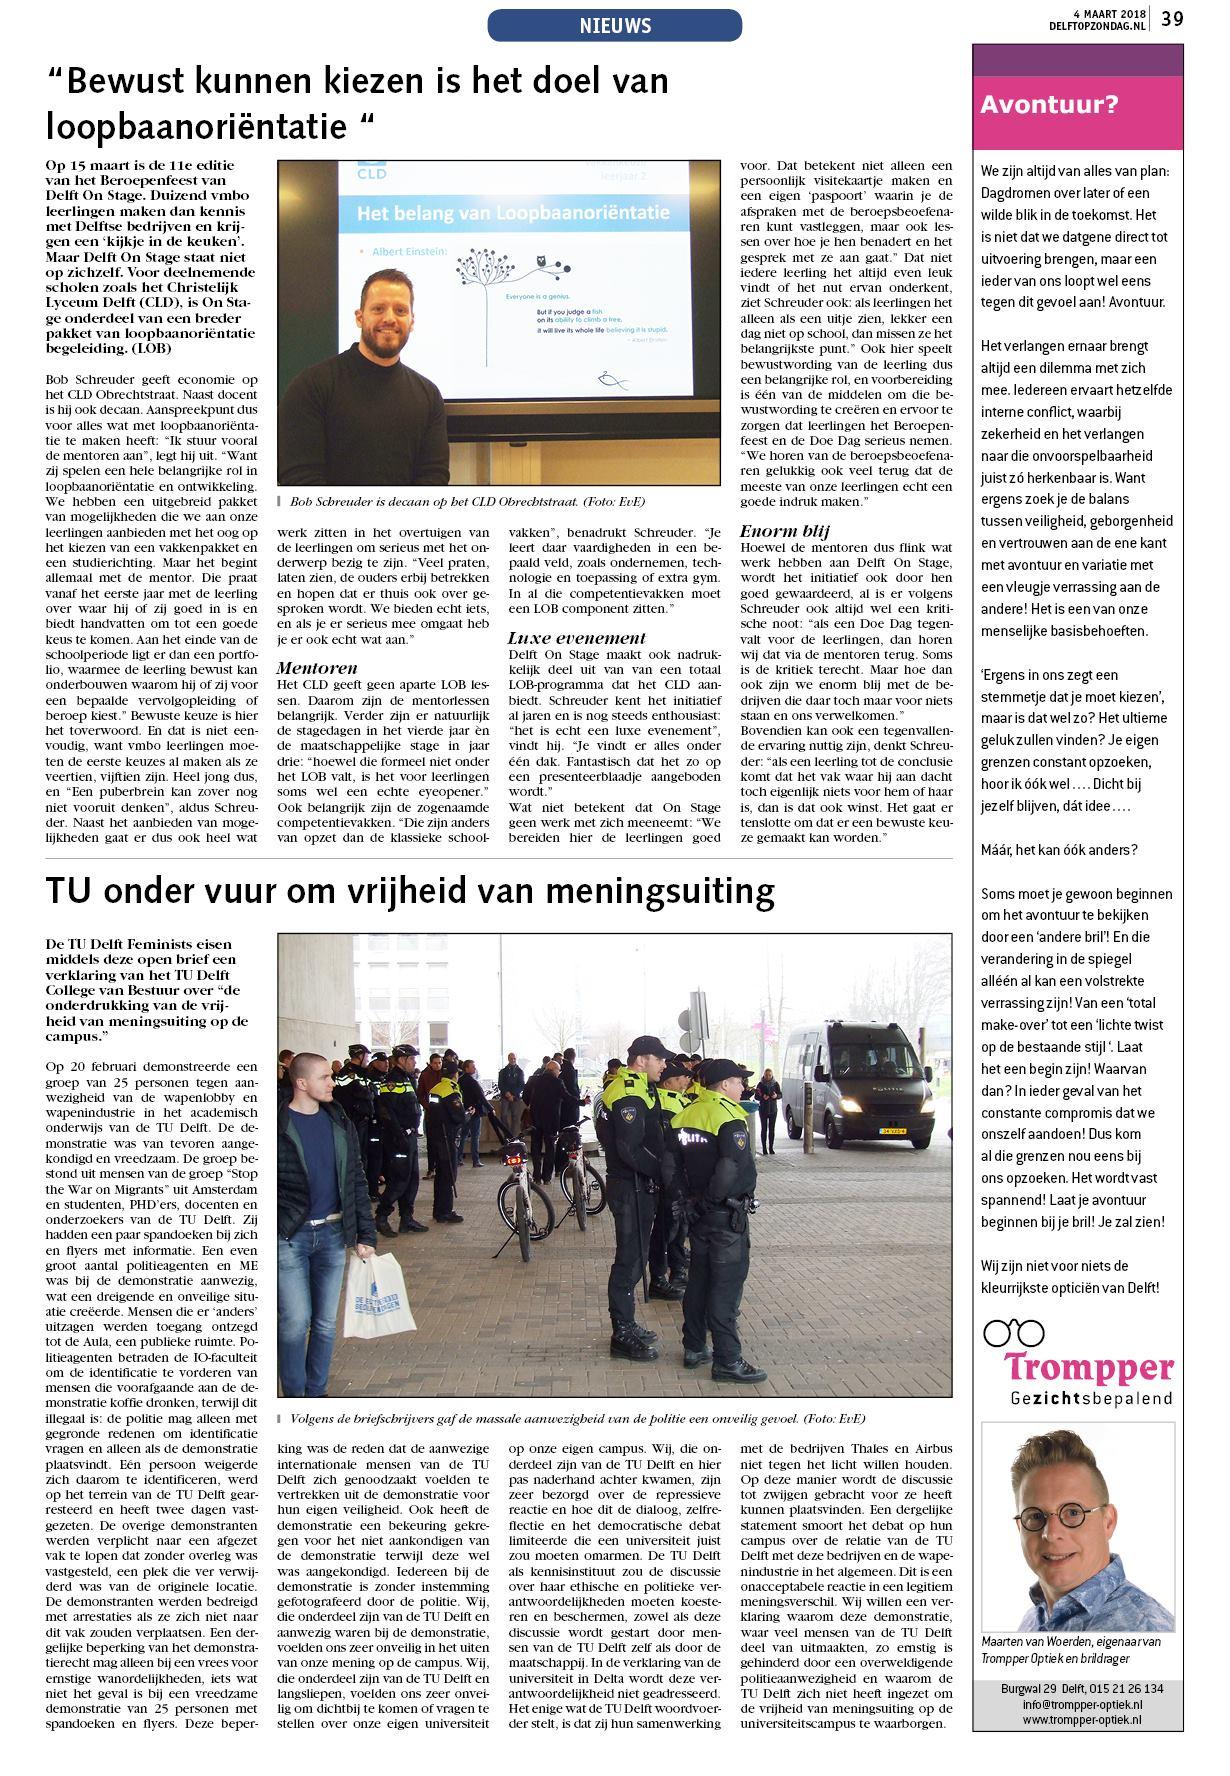 Delft Op Zondag Tu Onder Vuur Om Vrijheid Van Meningsuiting